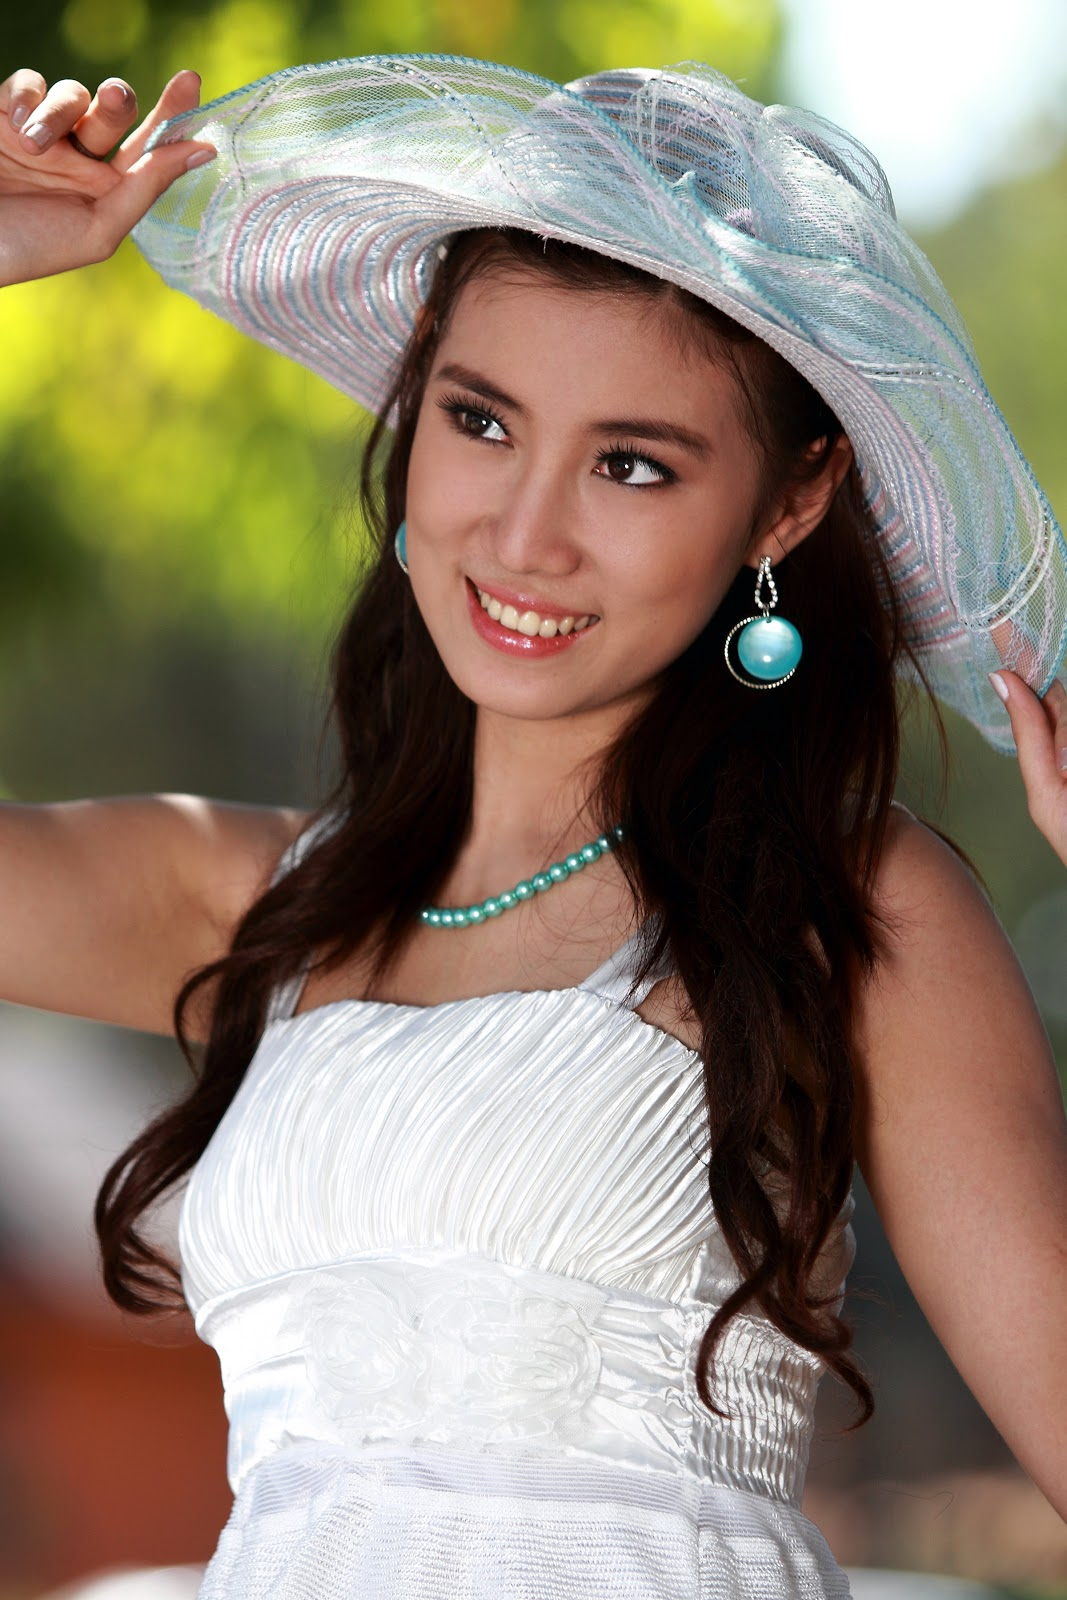 Myanmar Sexy Model Girl Photos Ju Ju Ks Outdoor Fashion-5155